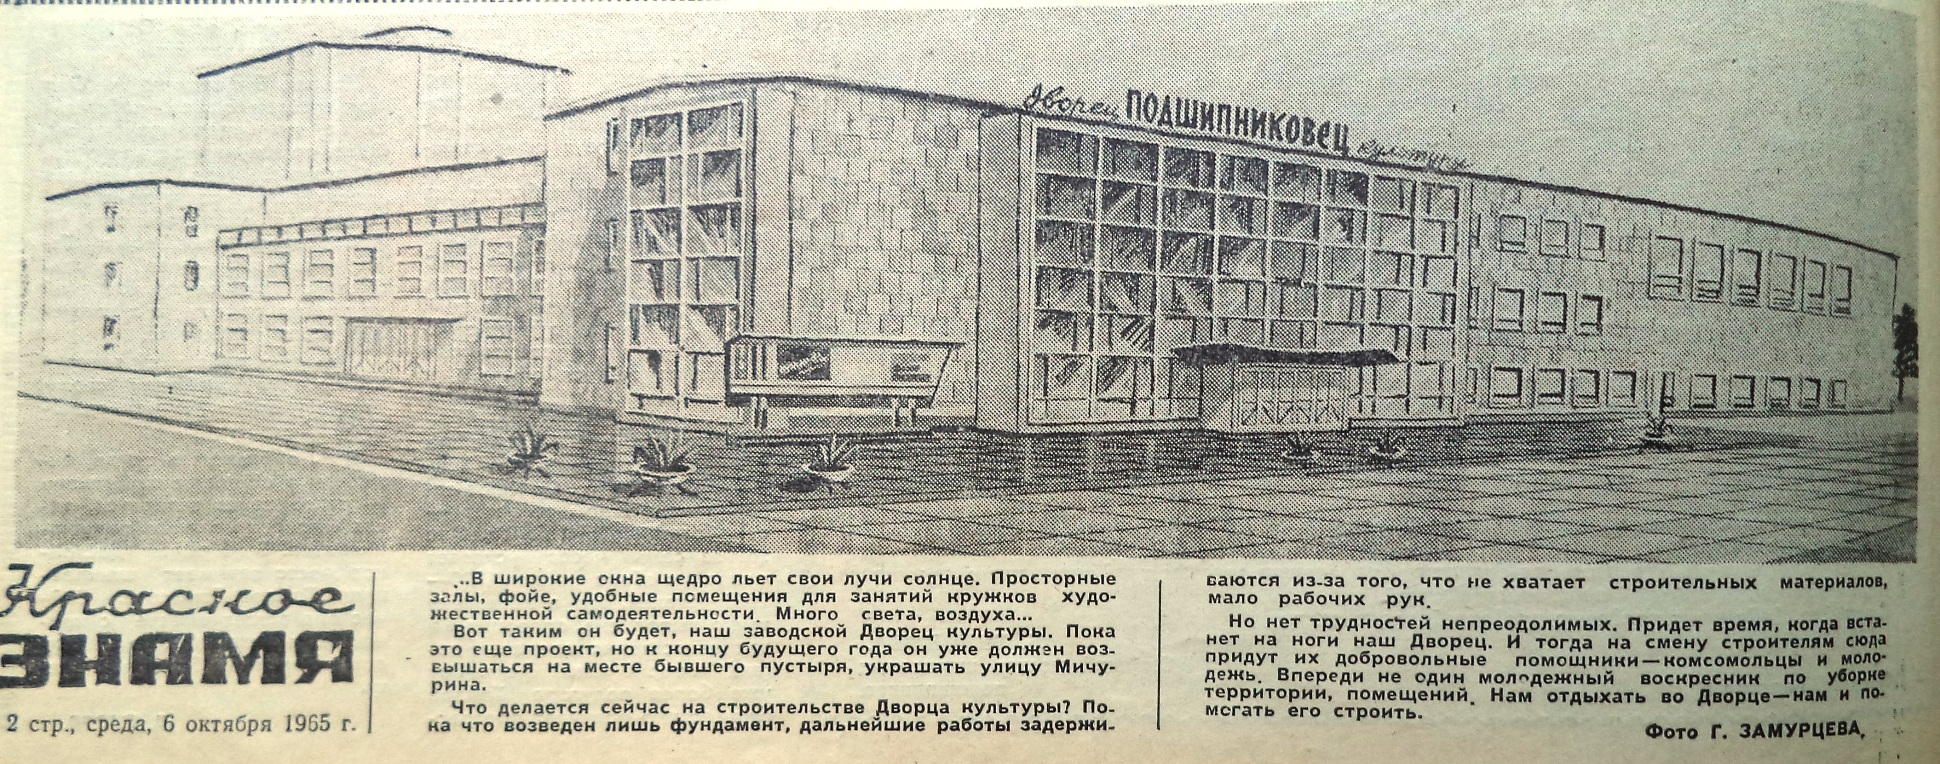 Мичурина-ФОТО-65-Красное Знамя-1965-6 октября